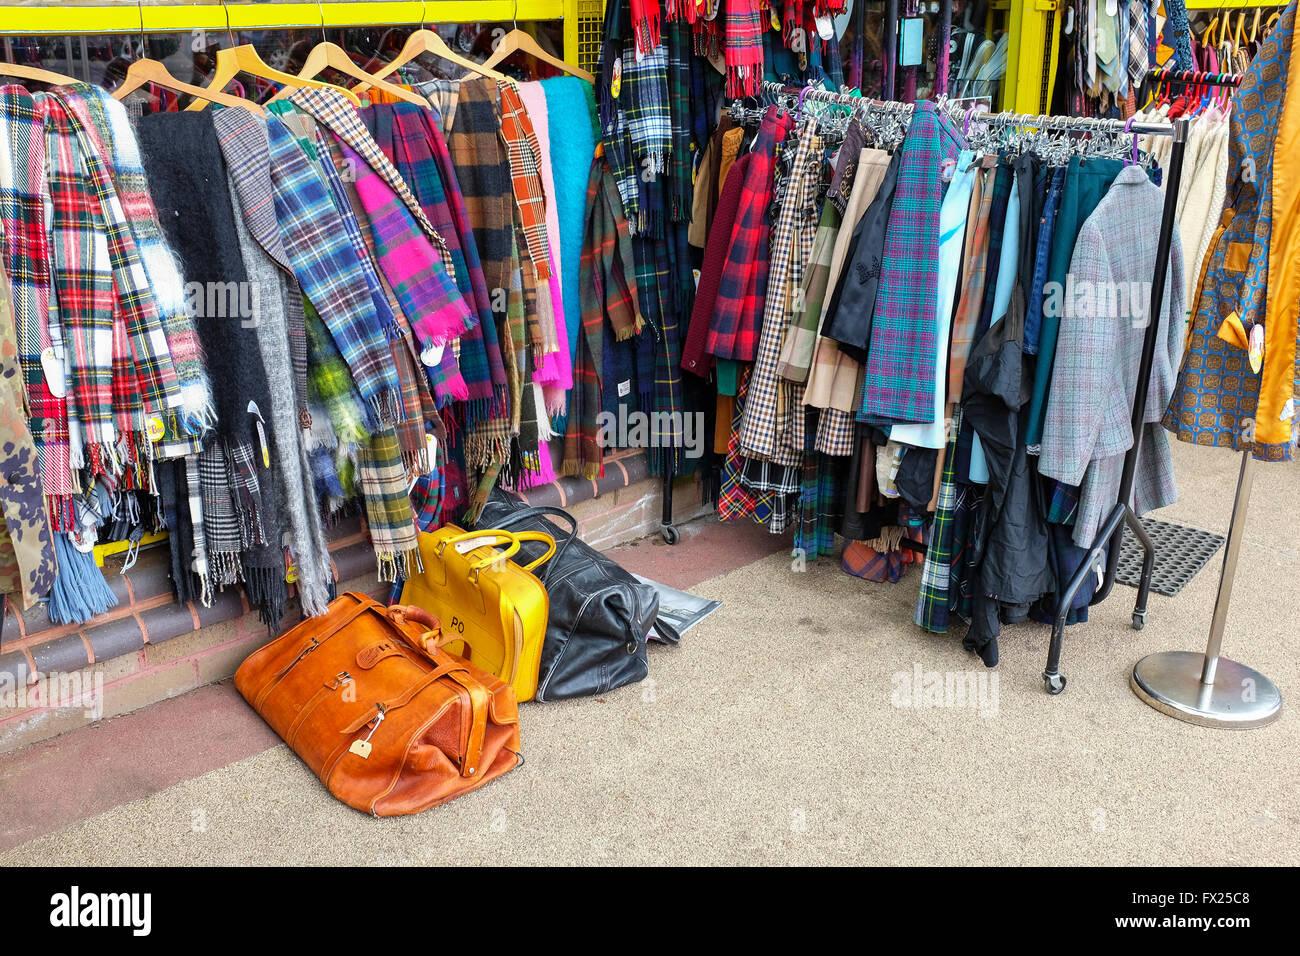 cf1b4878612 Used Clothing Store Photos   Used Clothing Store Images - Alamy